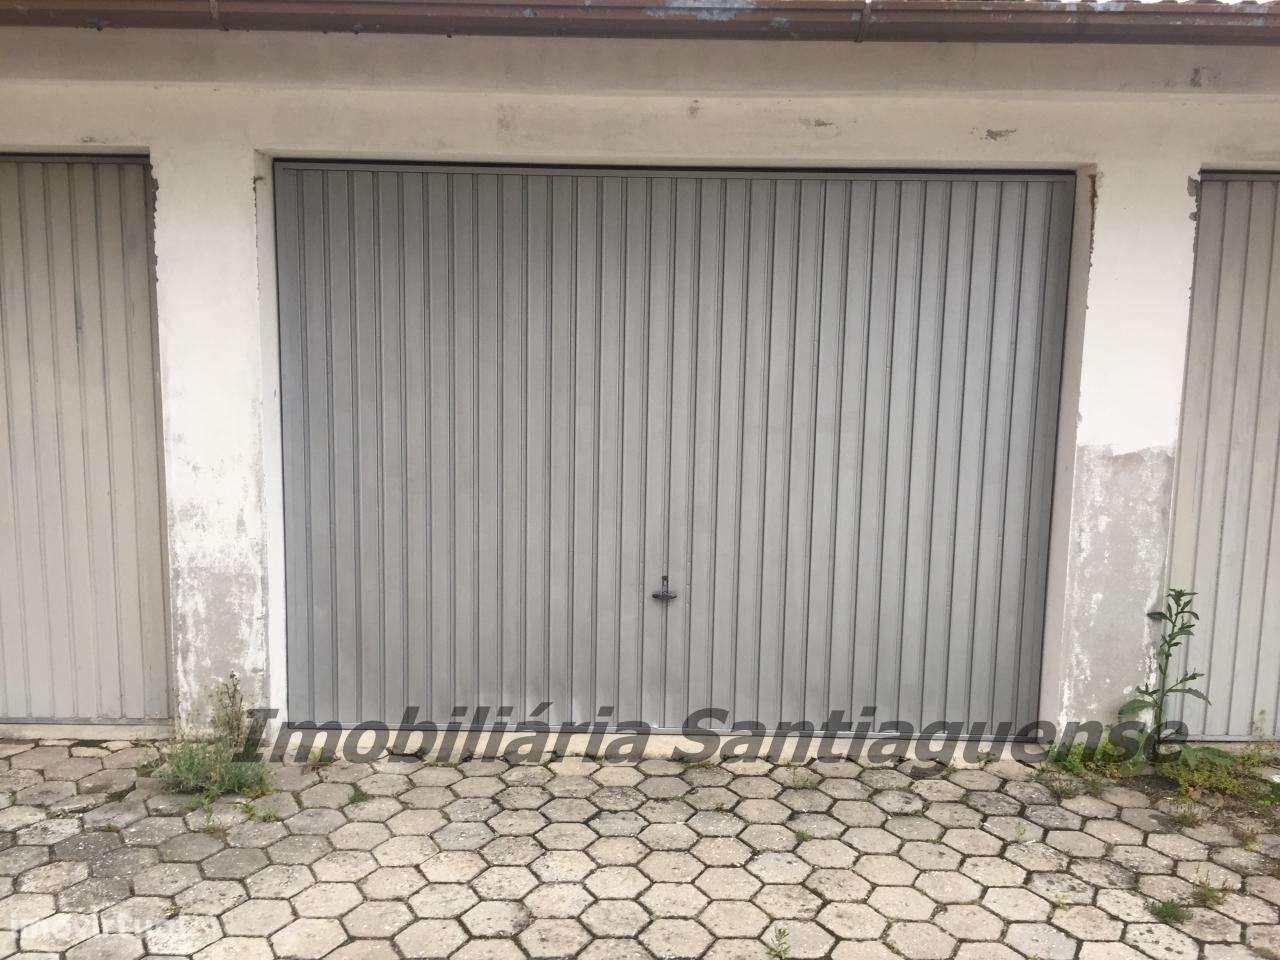 Apartamento para comprar, Vila de Cucujães, Aveiro - Foto 13